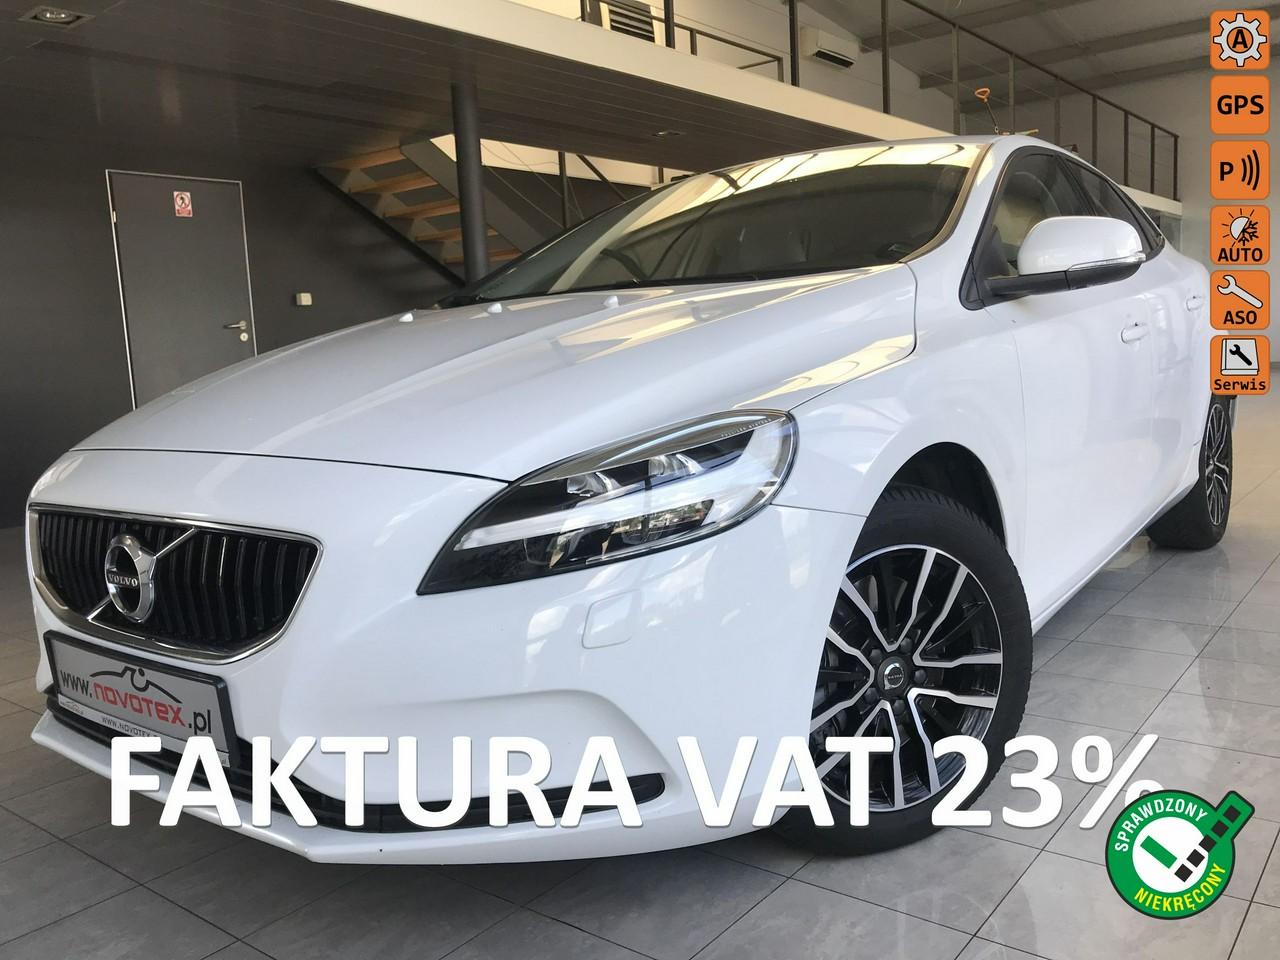 Volvo V40 D2*Kinetic*klimatronik*ALU*navi*Car-Pass*tylko 90Tkm*serwis ASO Volvo